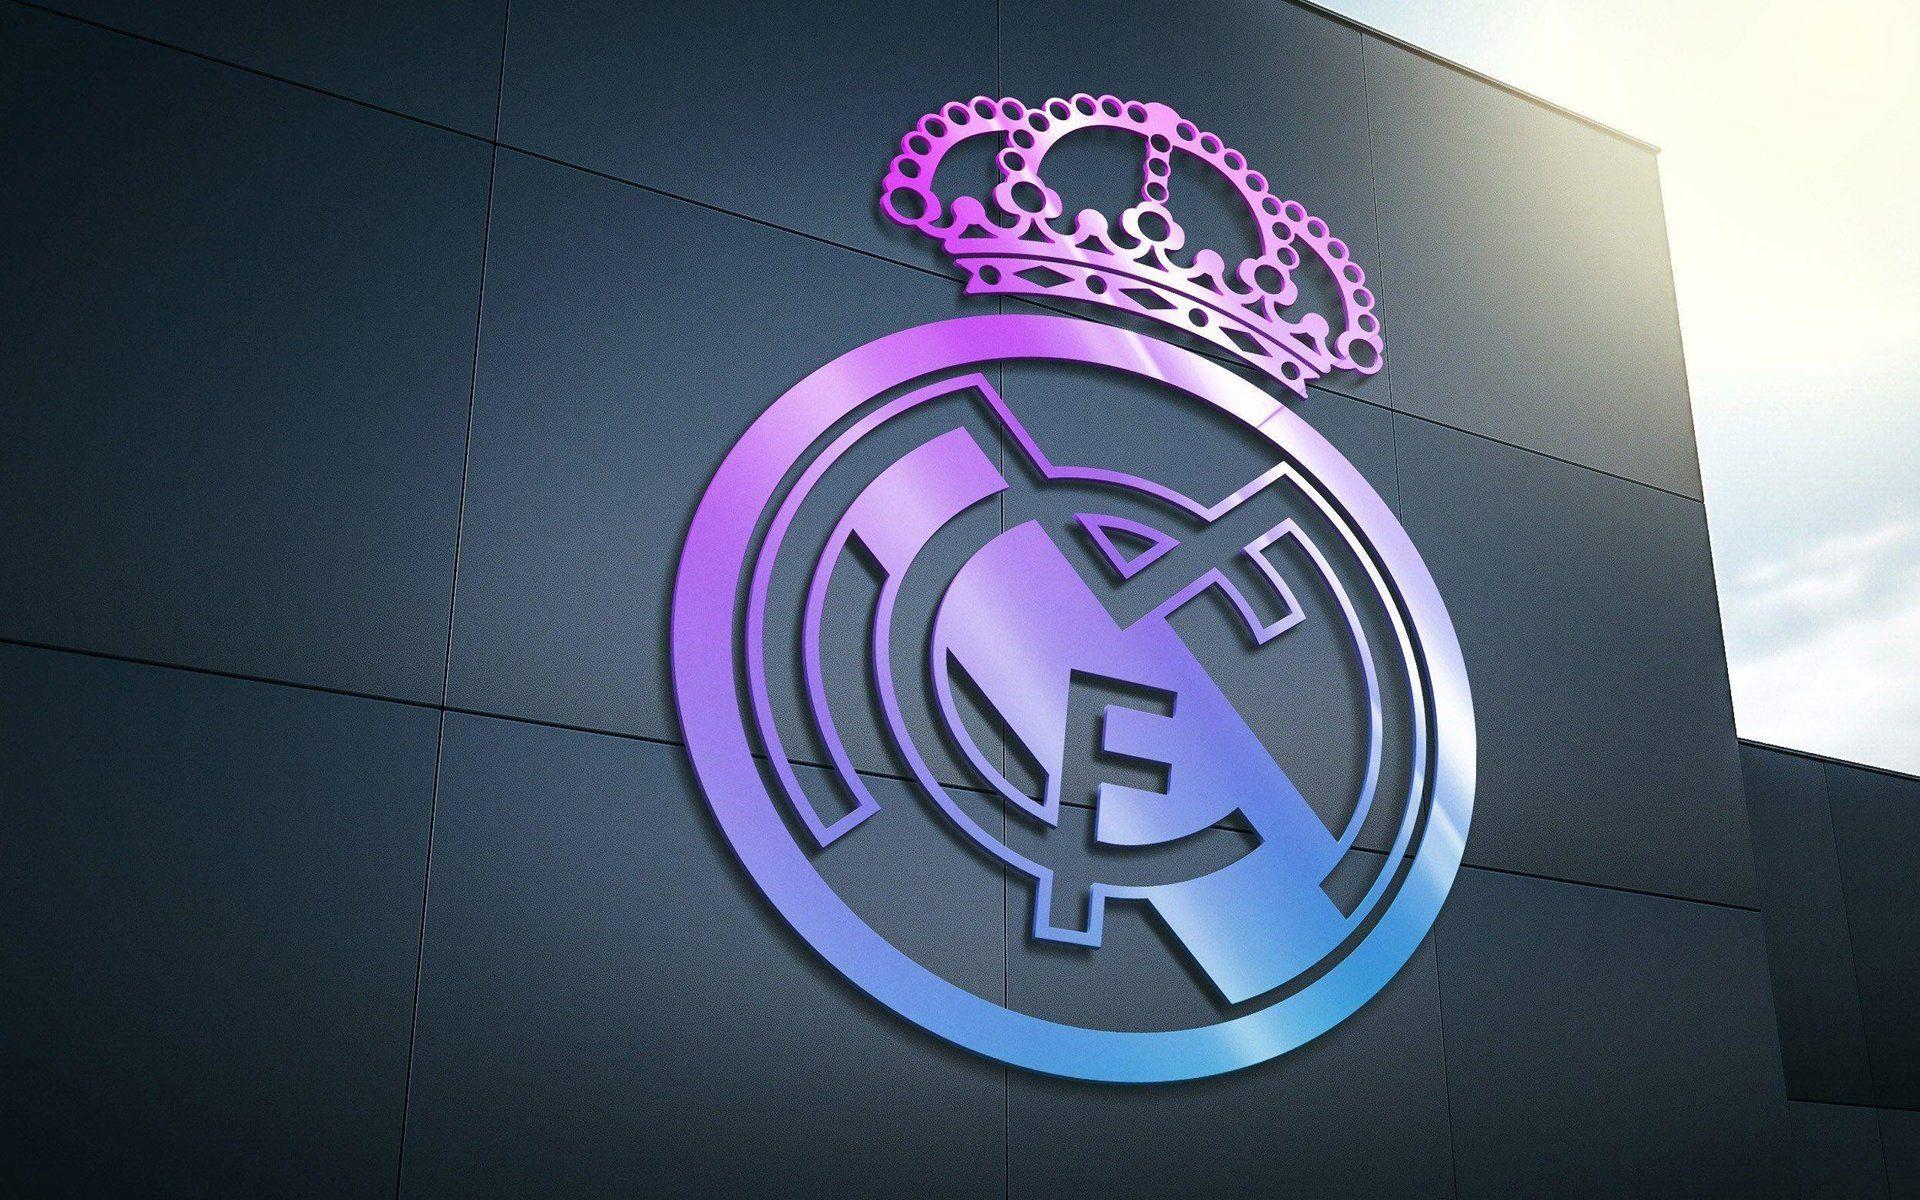 Pin By Karine Sl On Real Madrid Cf Logo Real Madrid Logo Wallpapers Madrid Wallpaper Real Madrid Logo